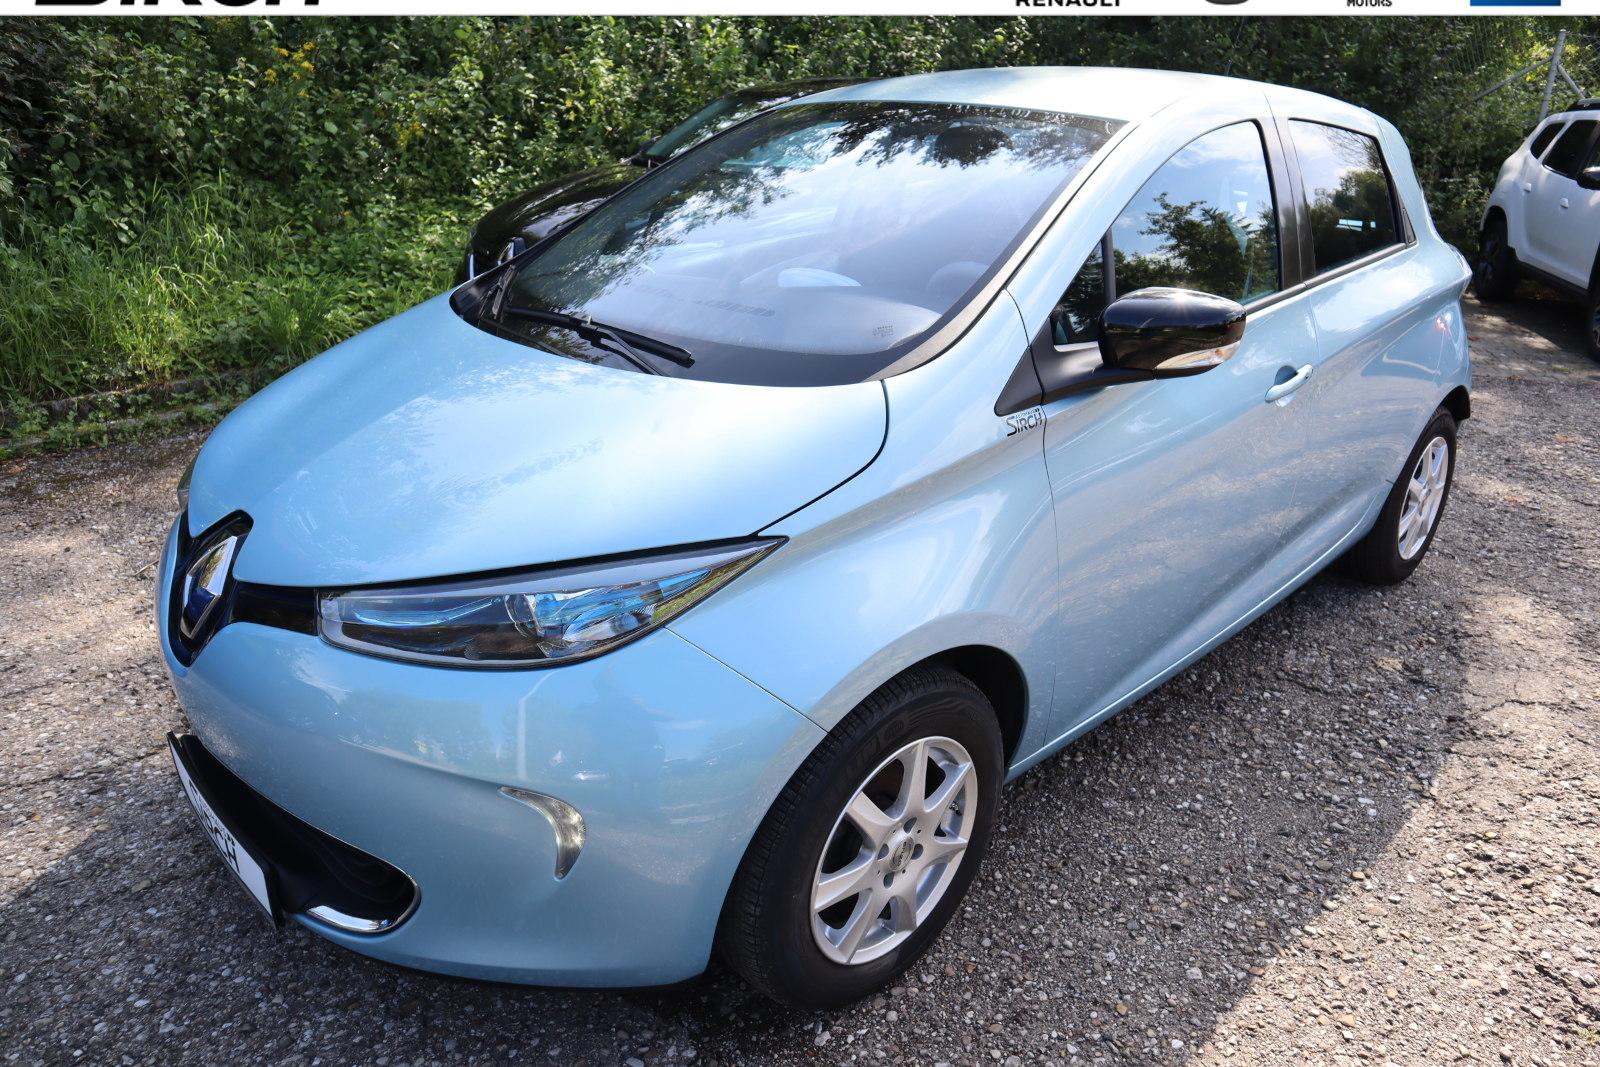 Renault ZOE Life 22 kw (Miet-Batterie) Akku Kauf möglic, Jahr 2015, Elektro